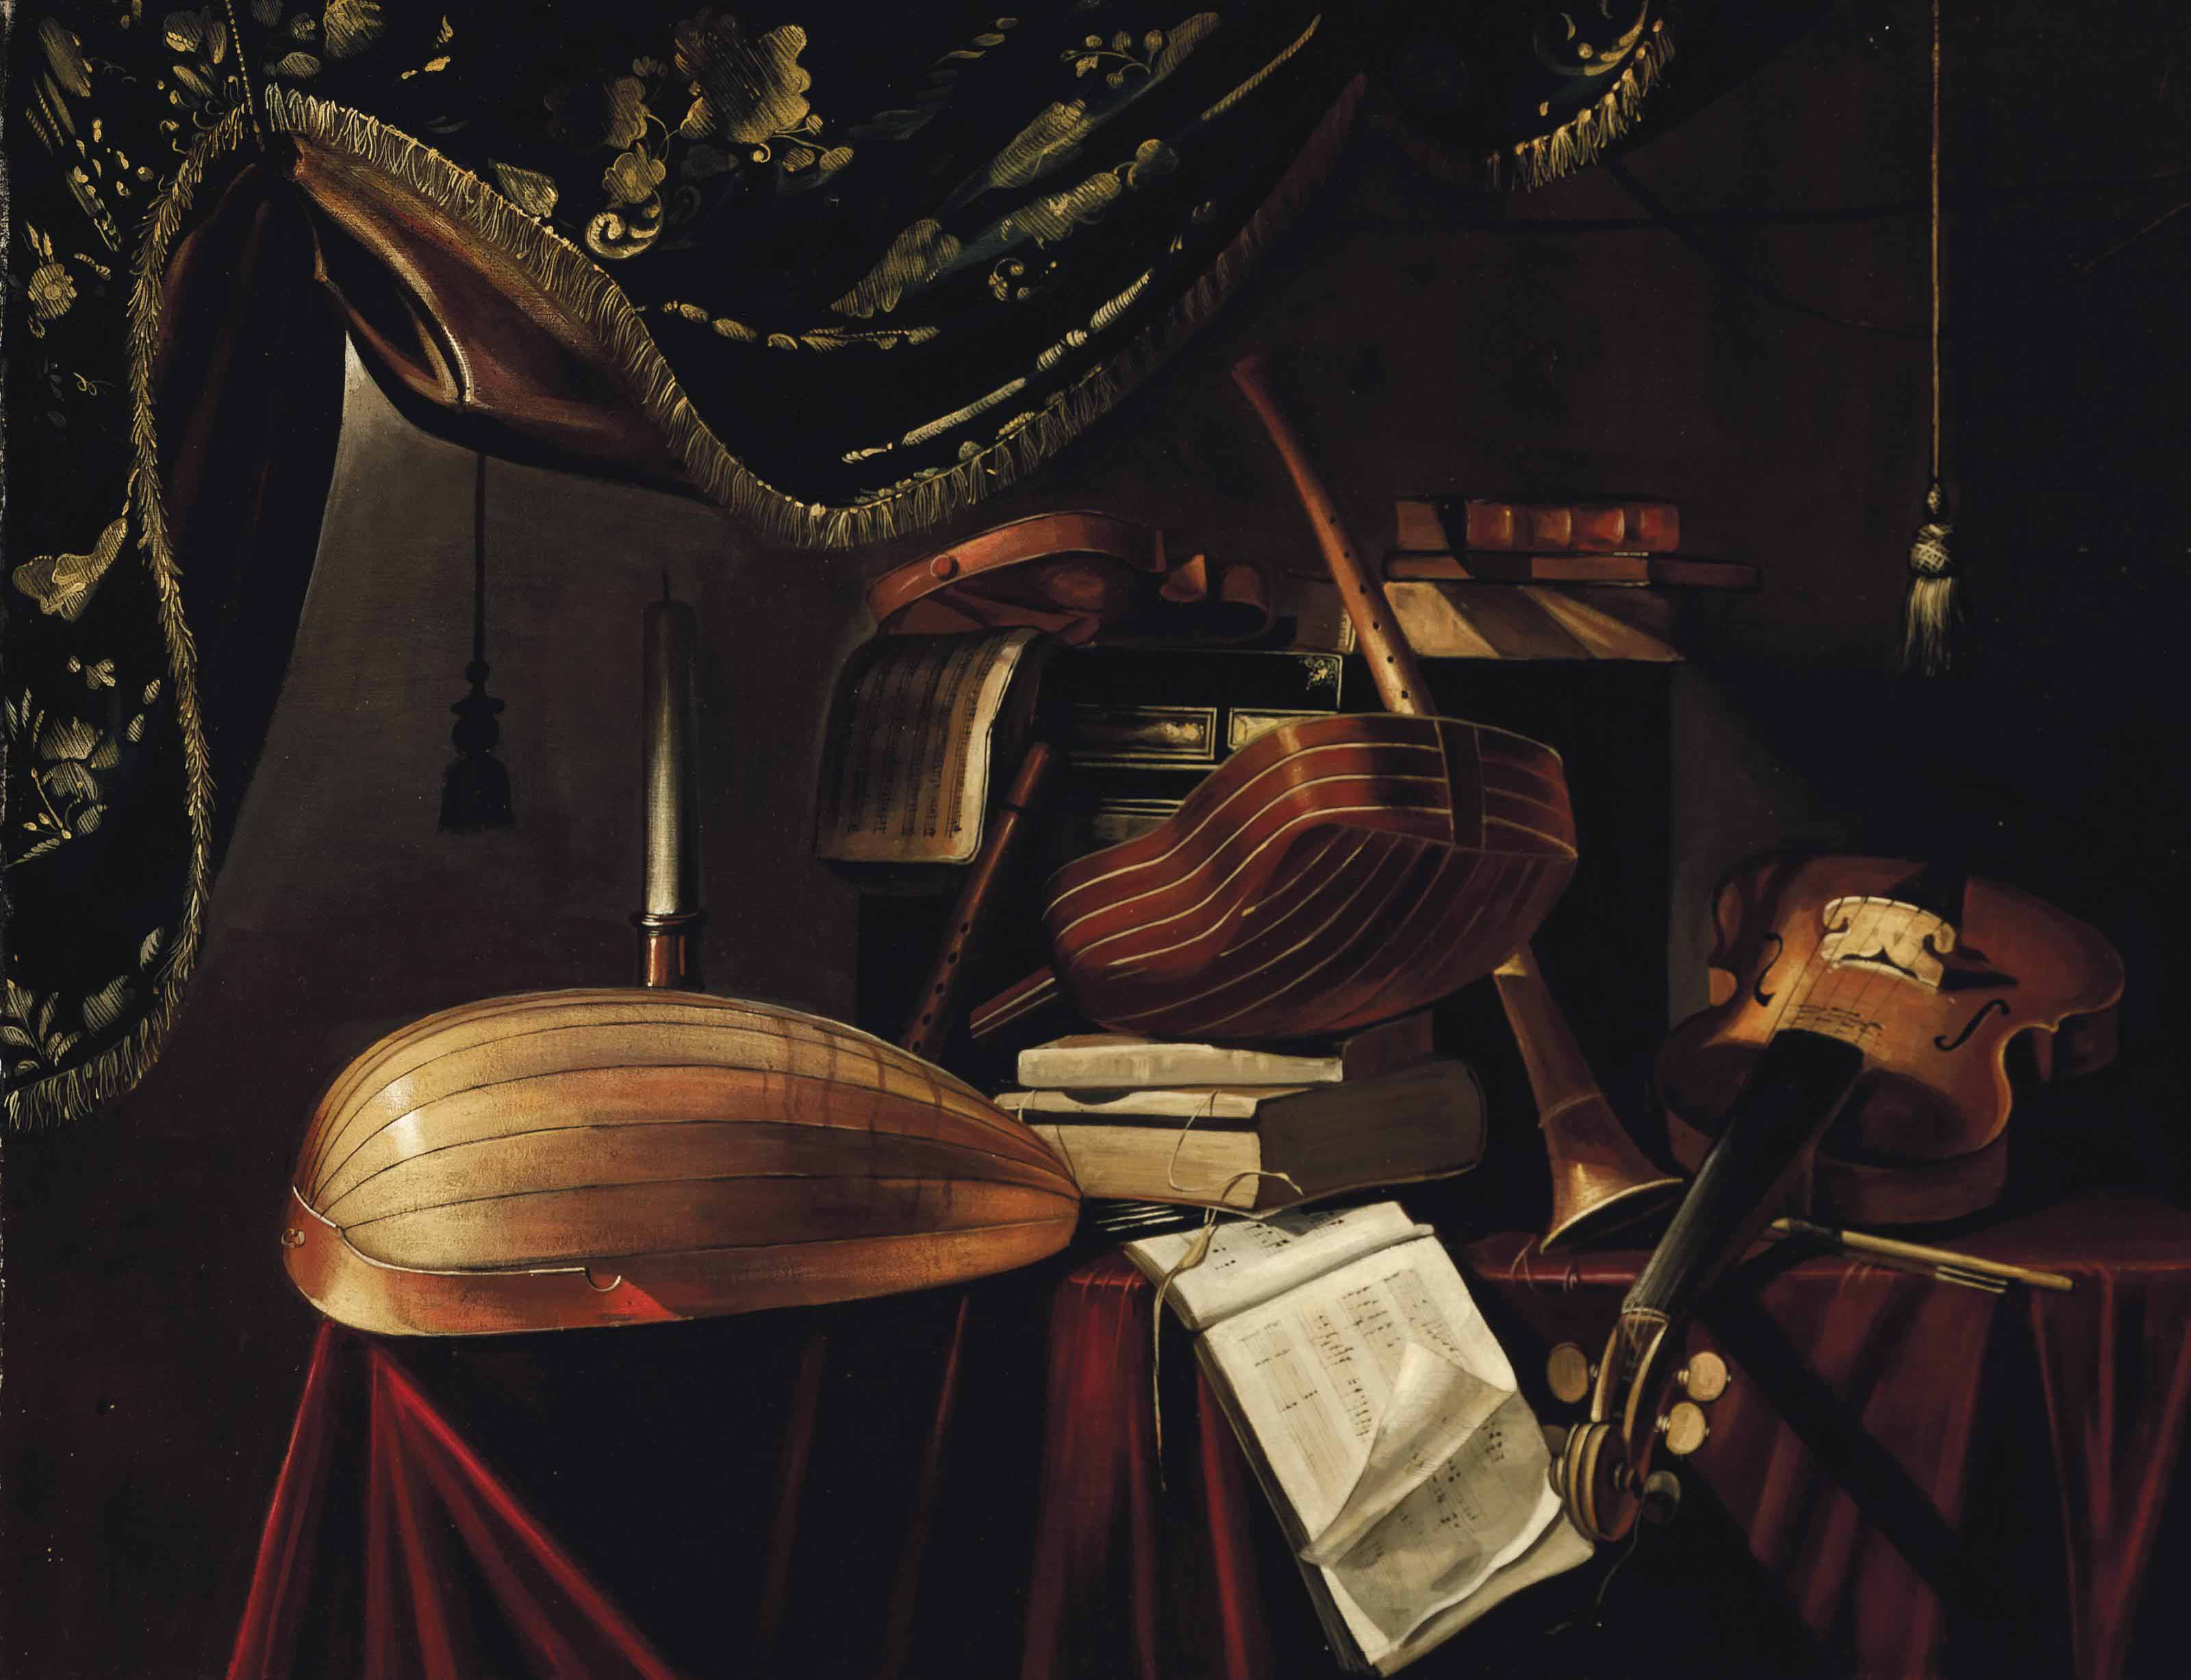 A mandolino, a lute, a violin, a guitar, a clarinet and musical manuscripts on a draped table in an interior